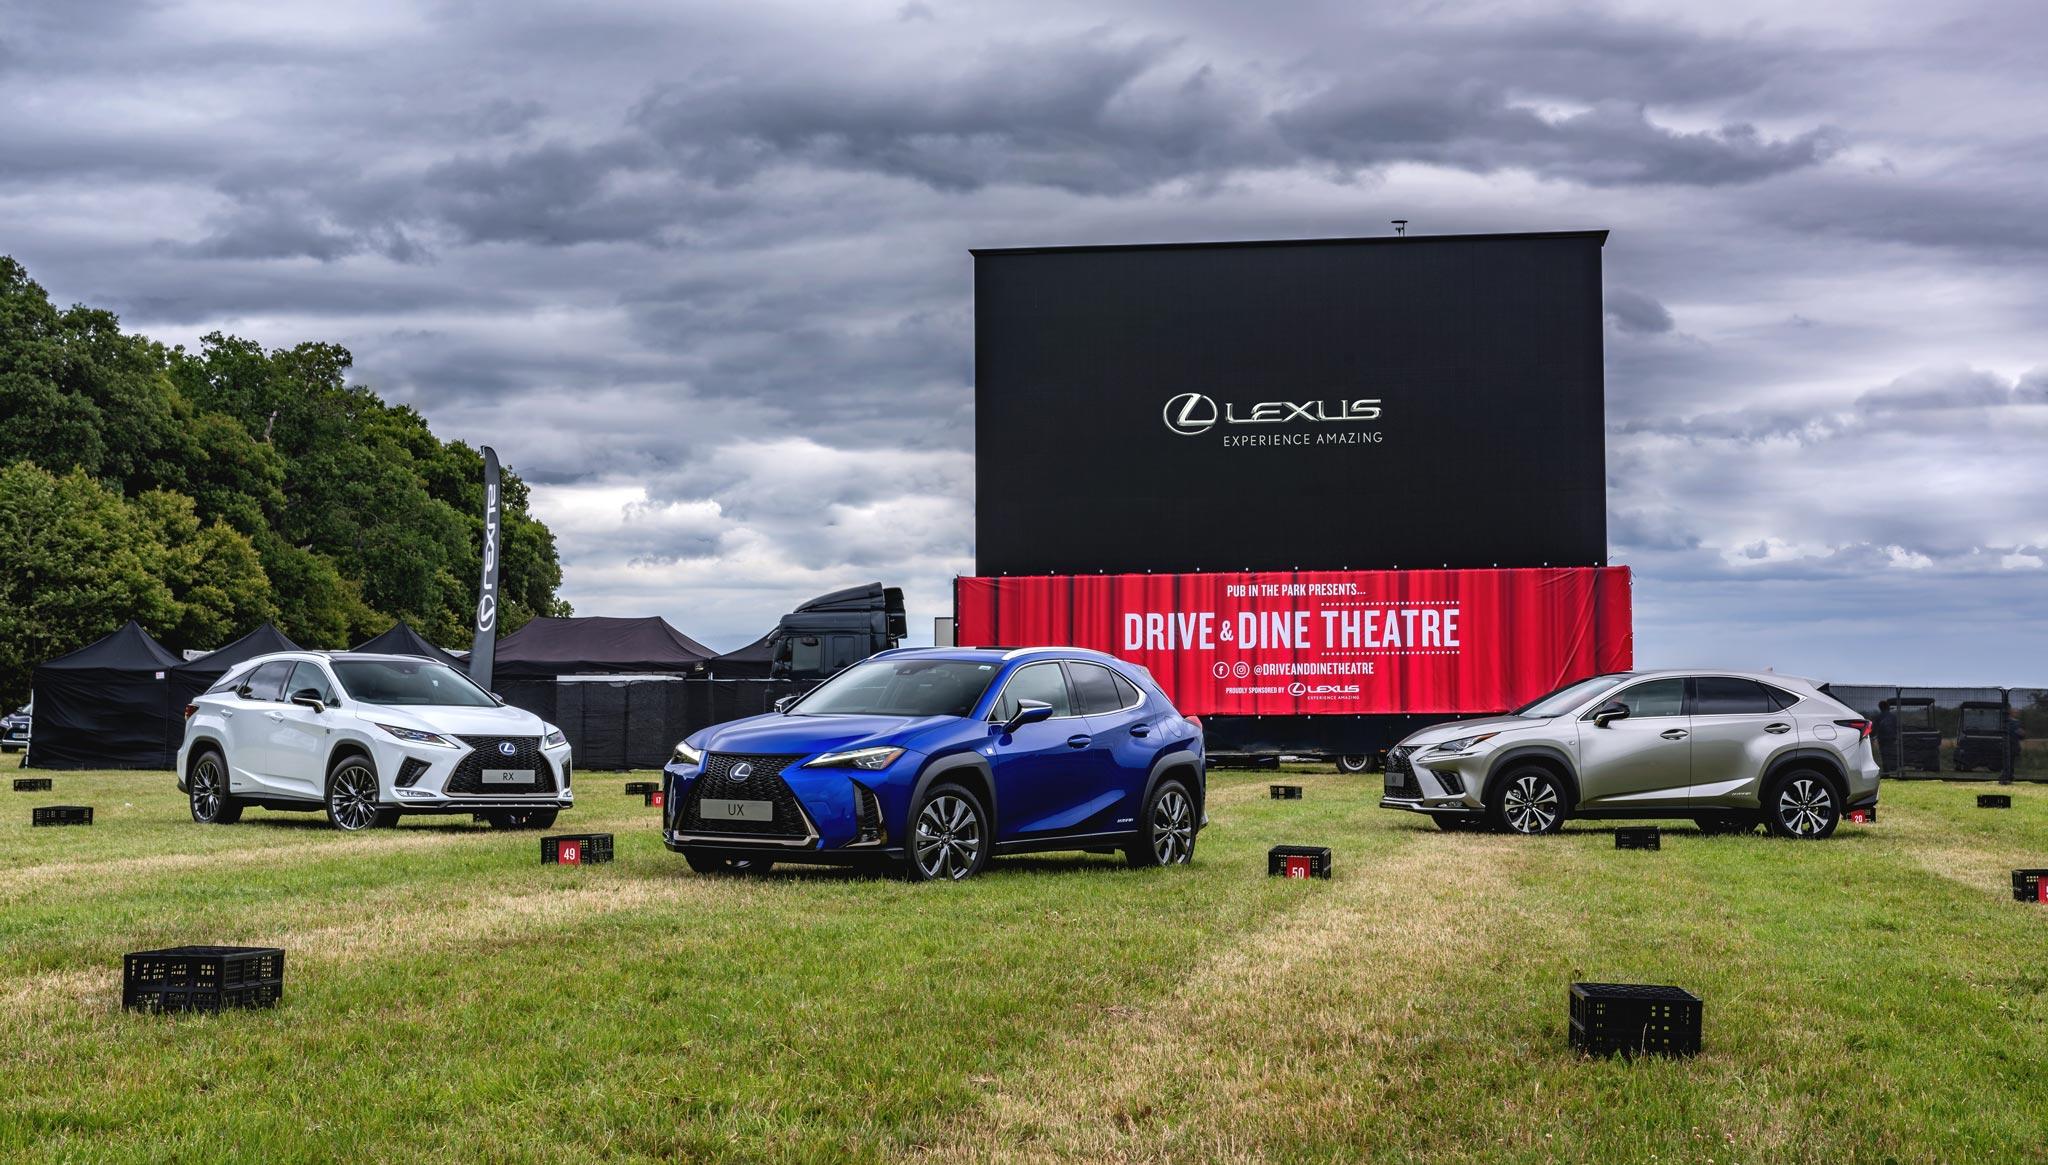 Lexus Event Photography by automotive photographer Dean Wright